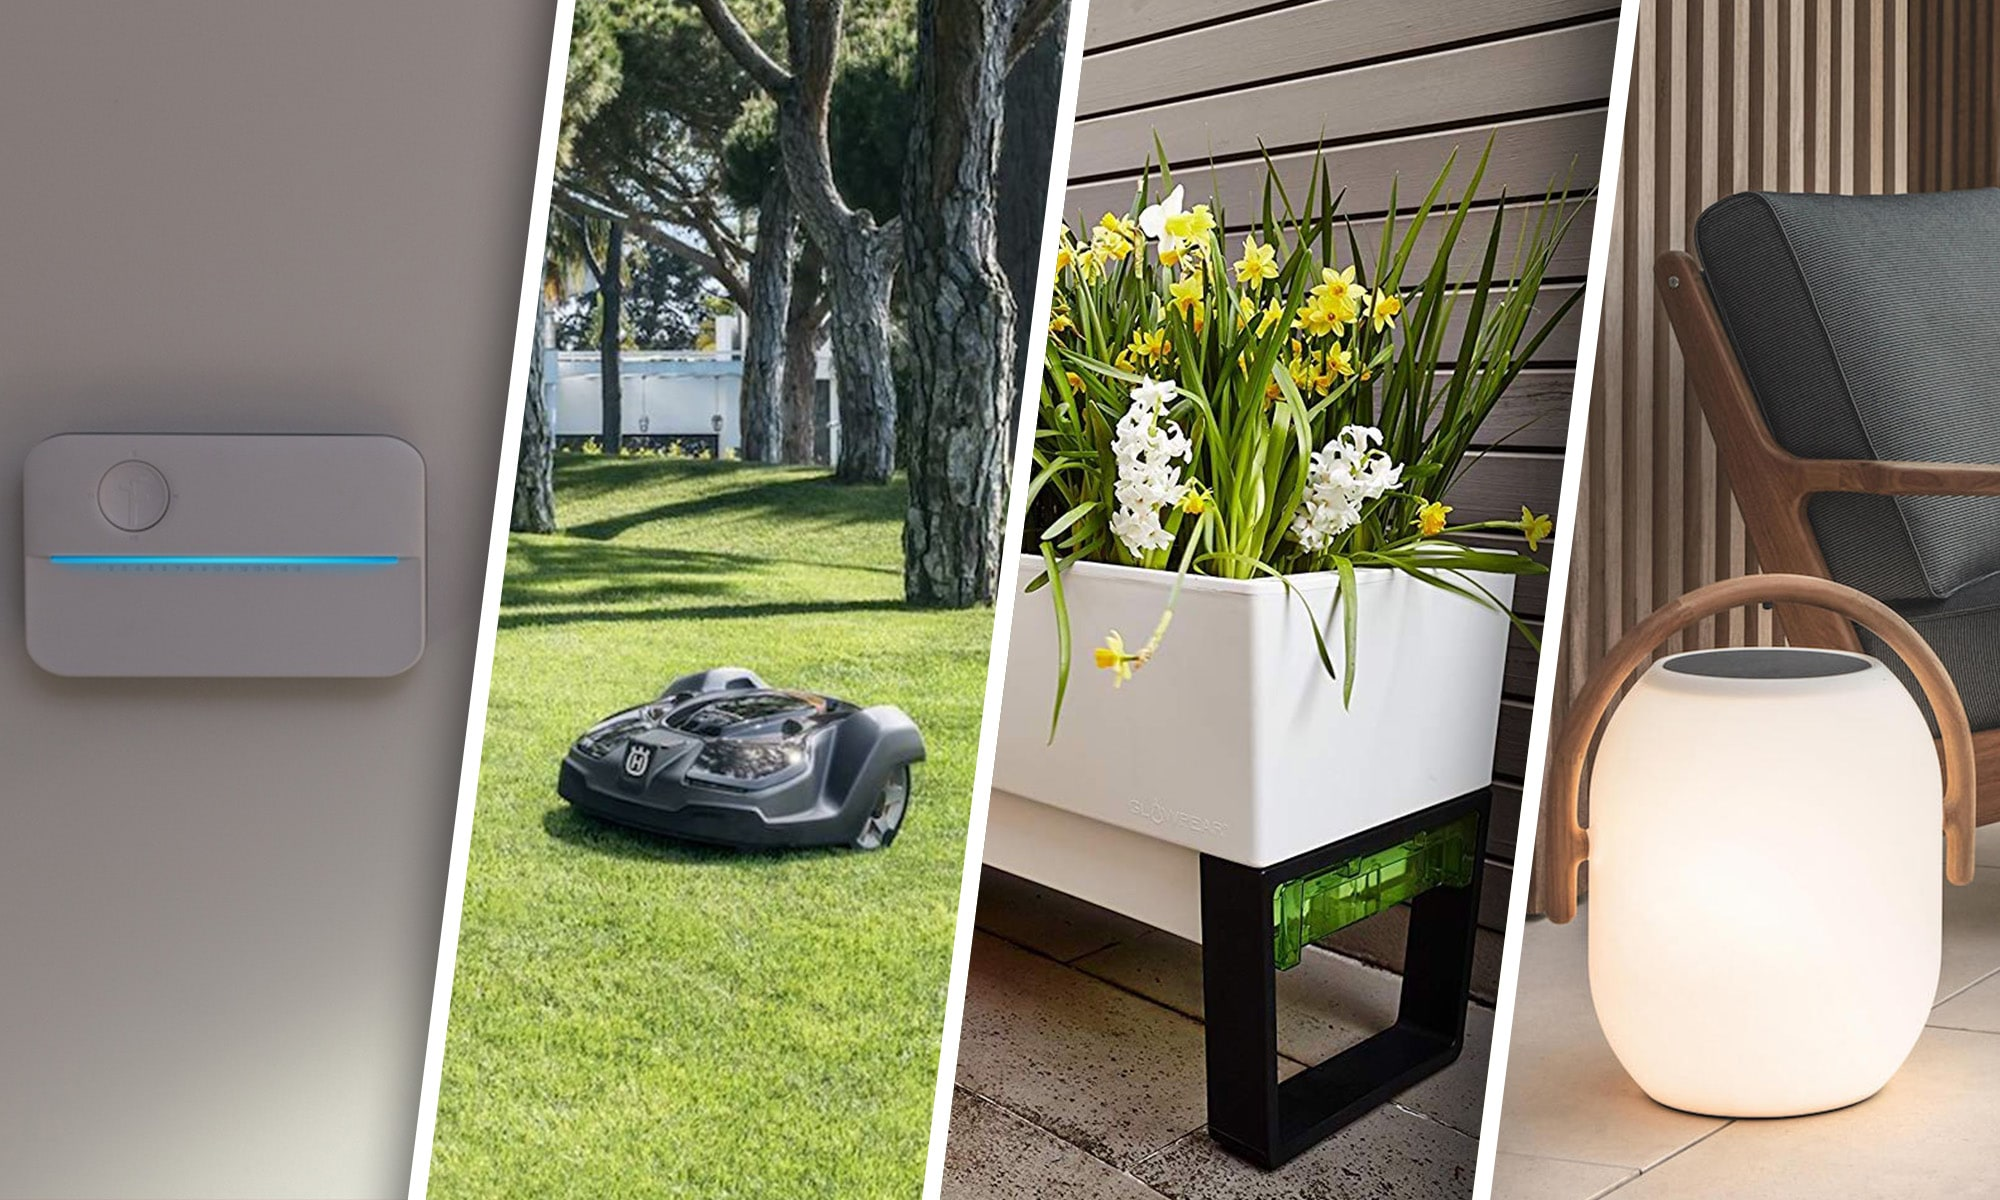 smart-garden-gadgets-featured-image.jpg